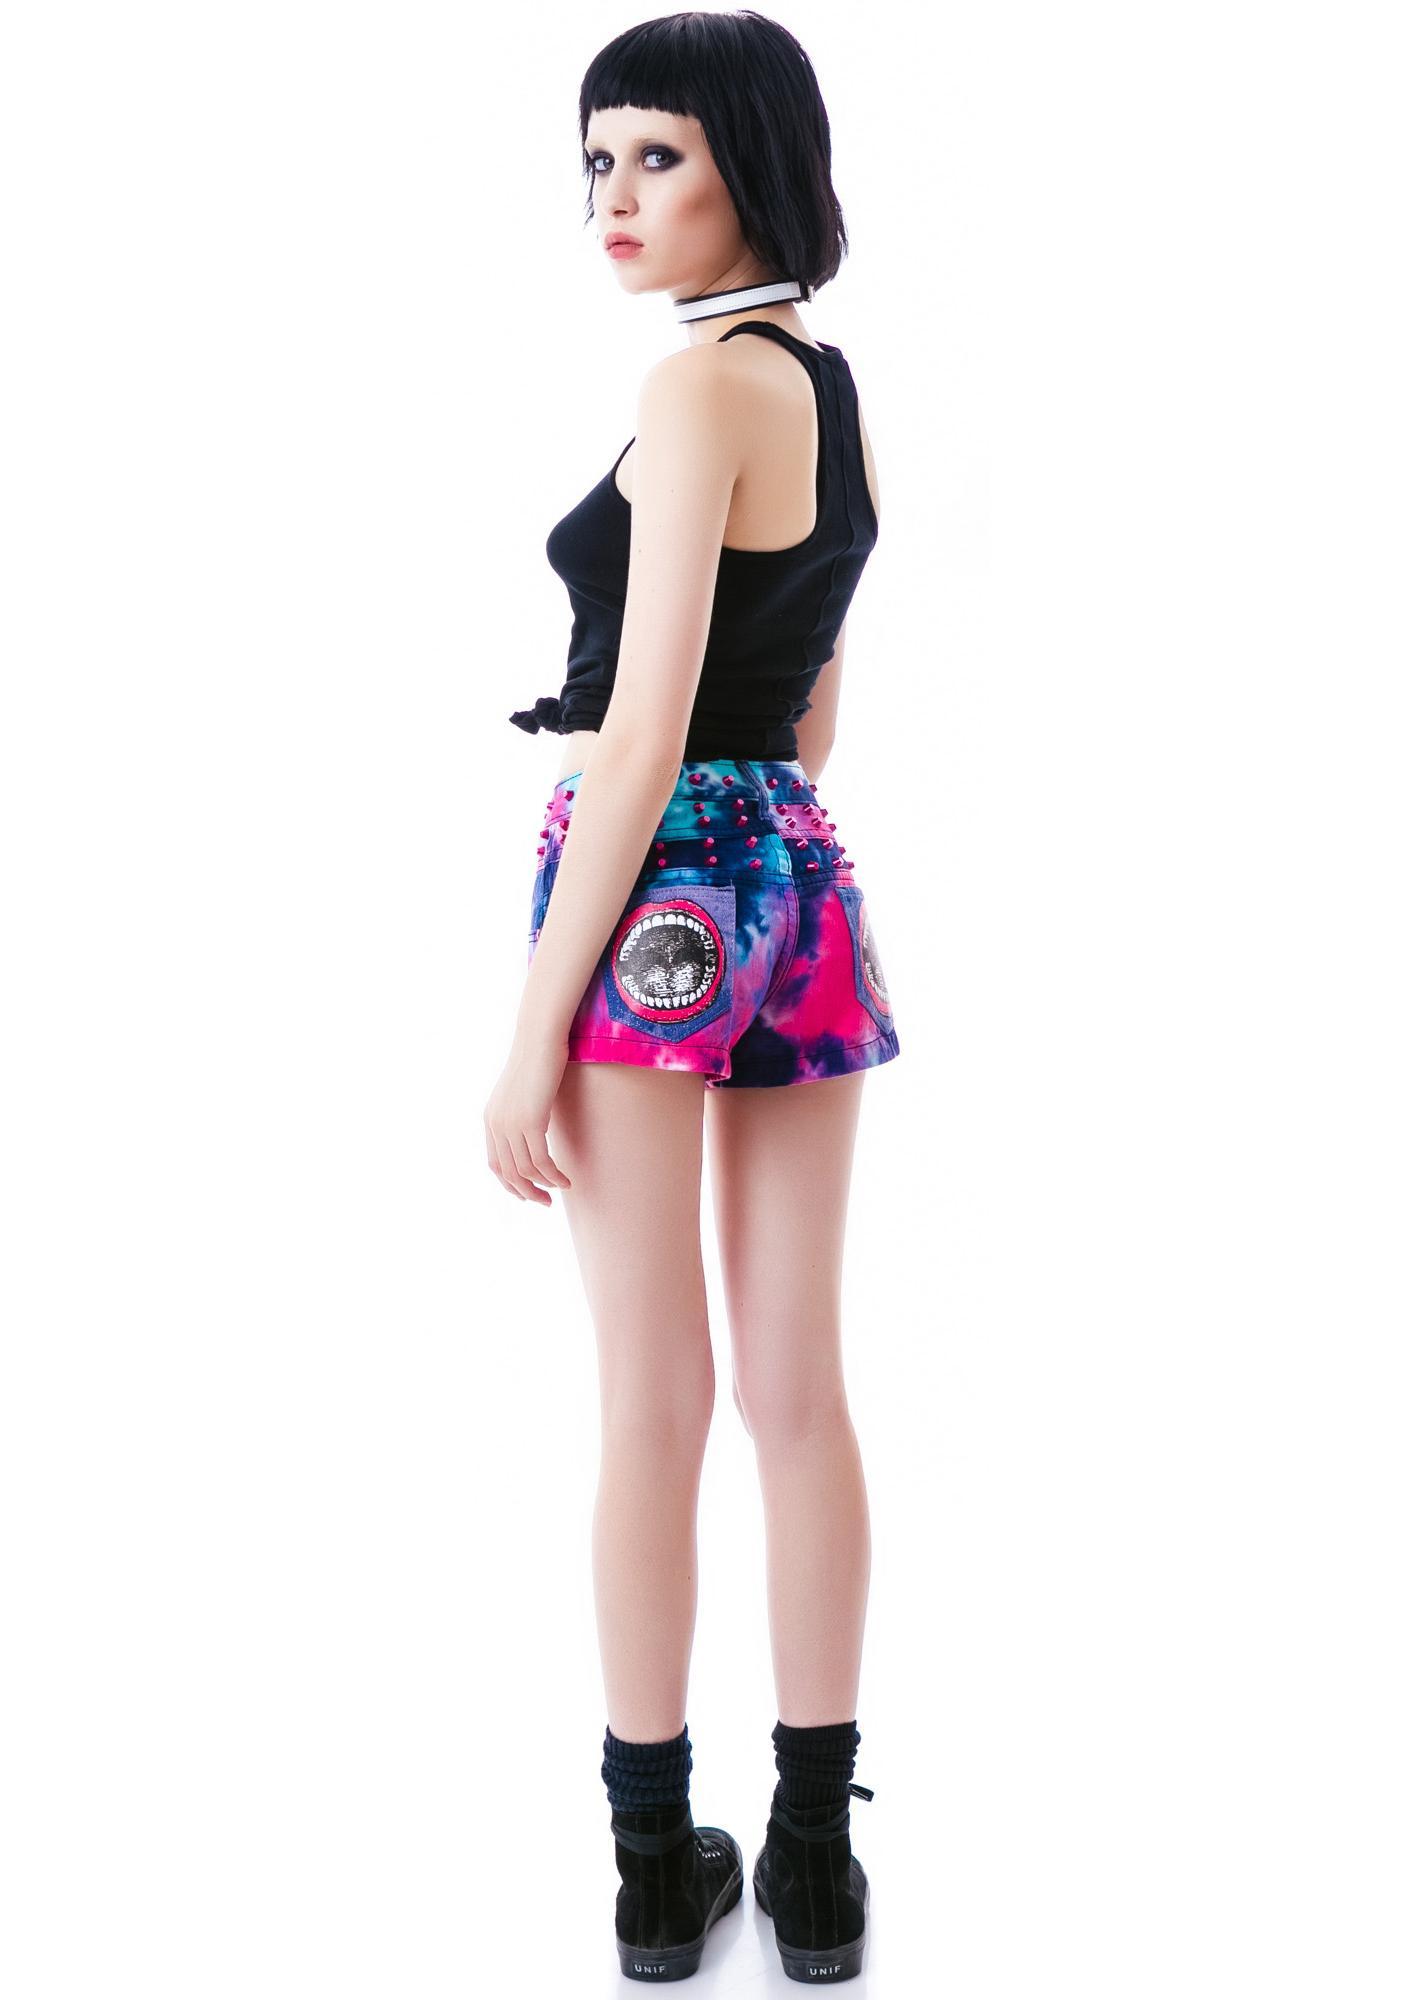 Too Fast Flower Power Cowabunga Stud Shorts